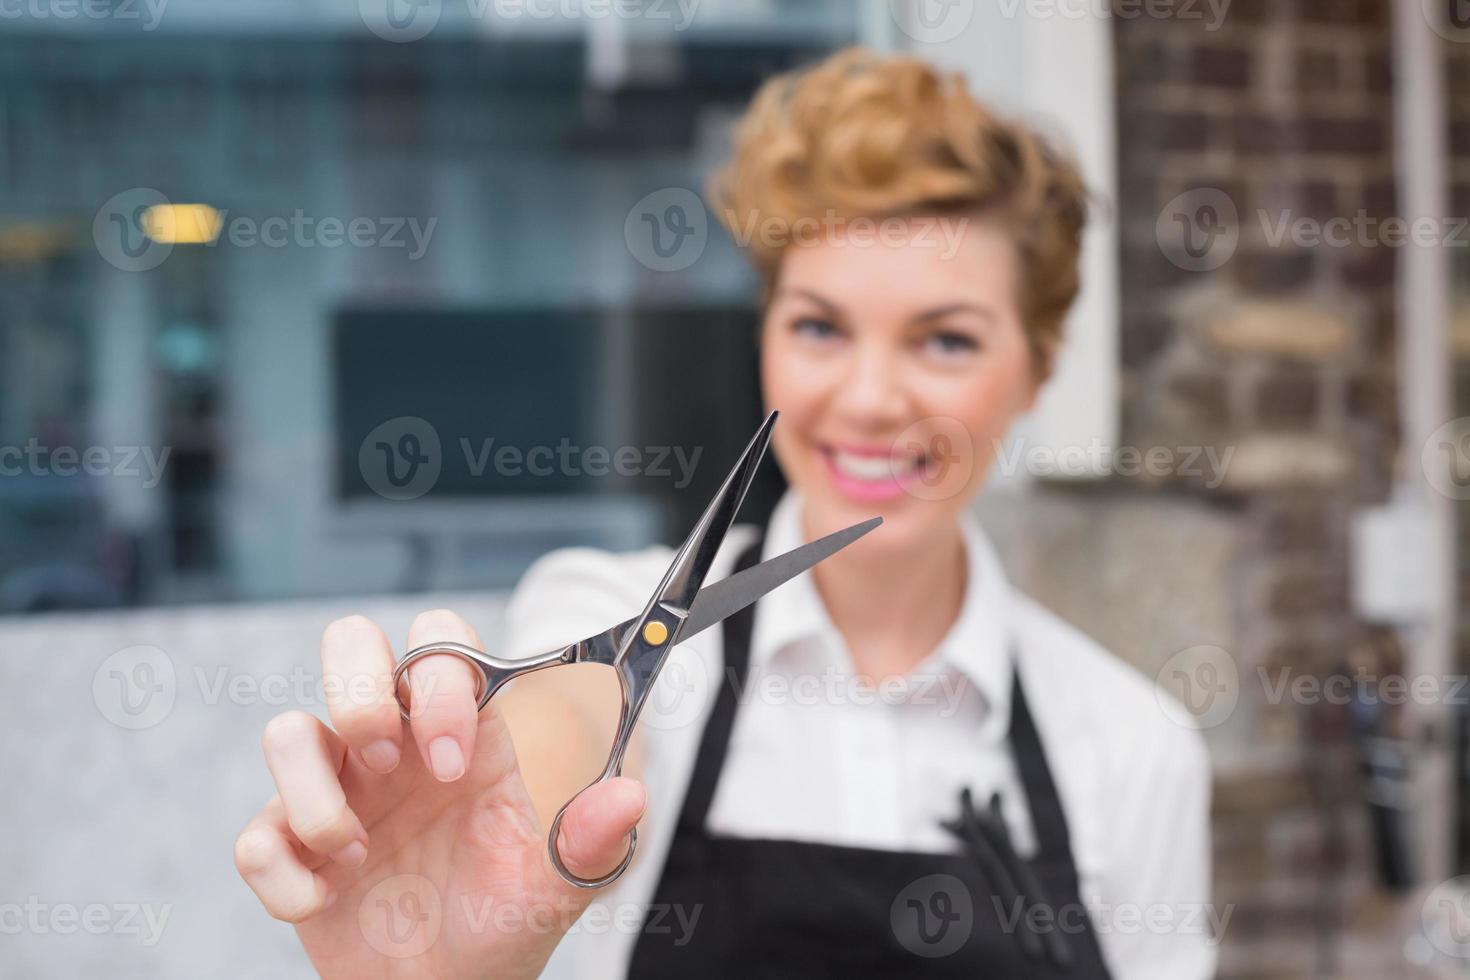 peluquero seguro sonriendo a la cámara foto